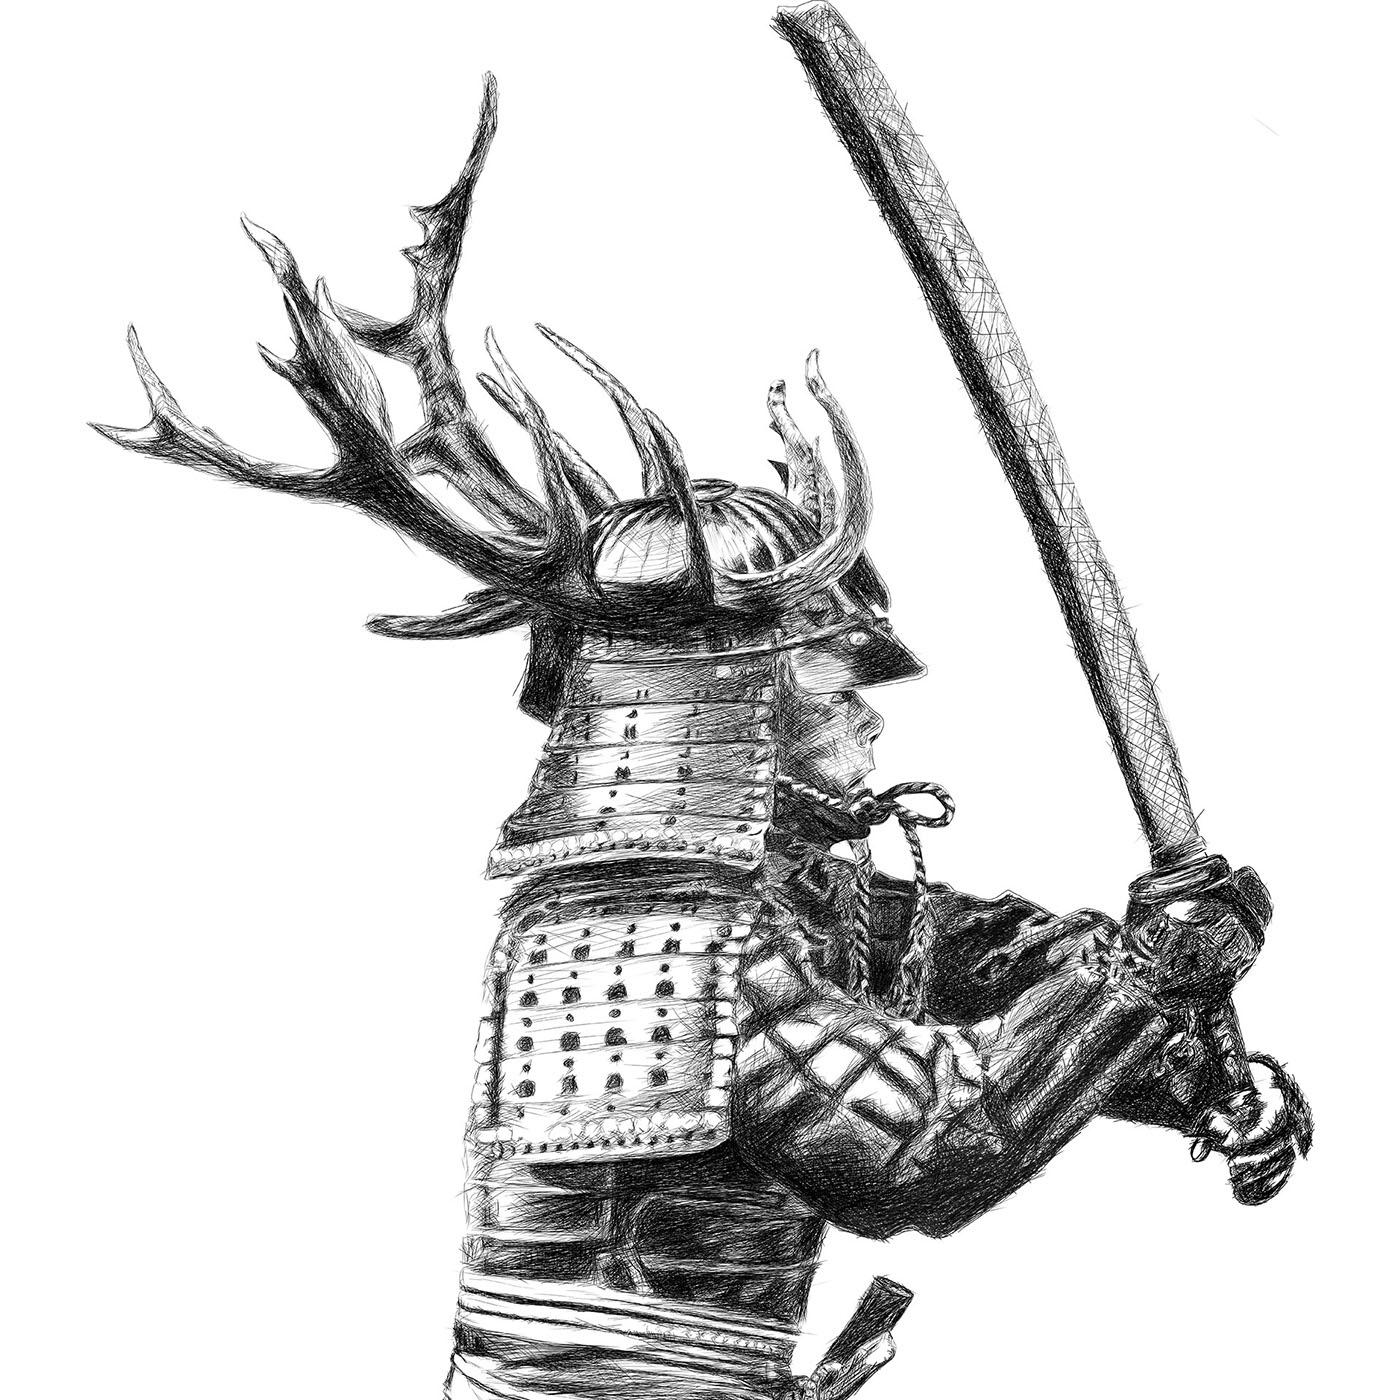 Samurai line drawing digital pencil ציור קווי סמוראי עיפרון דיגיטלי